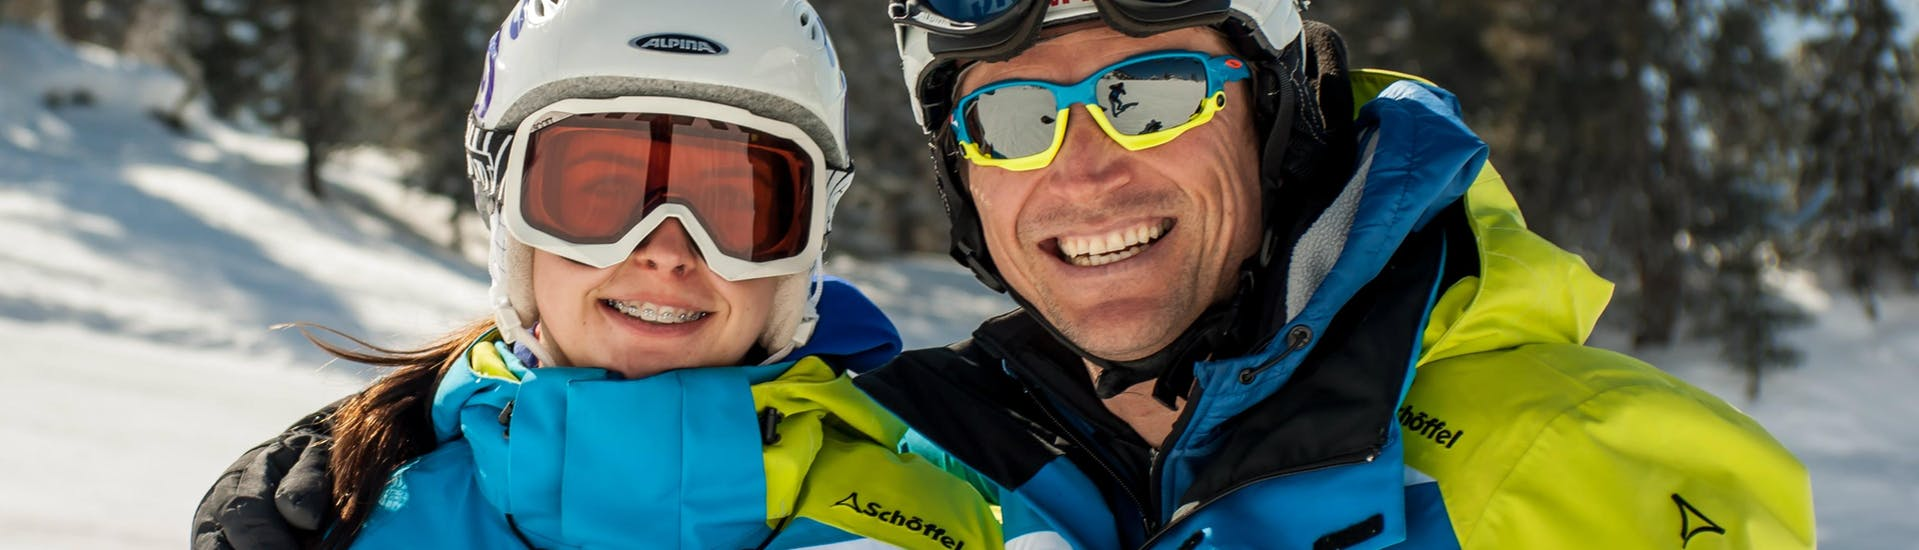 Private Off-Piste Skiing Lessons for All Levels avec Skischool MALI / MALISPORT Oetz - Hero image